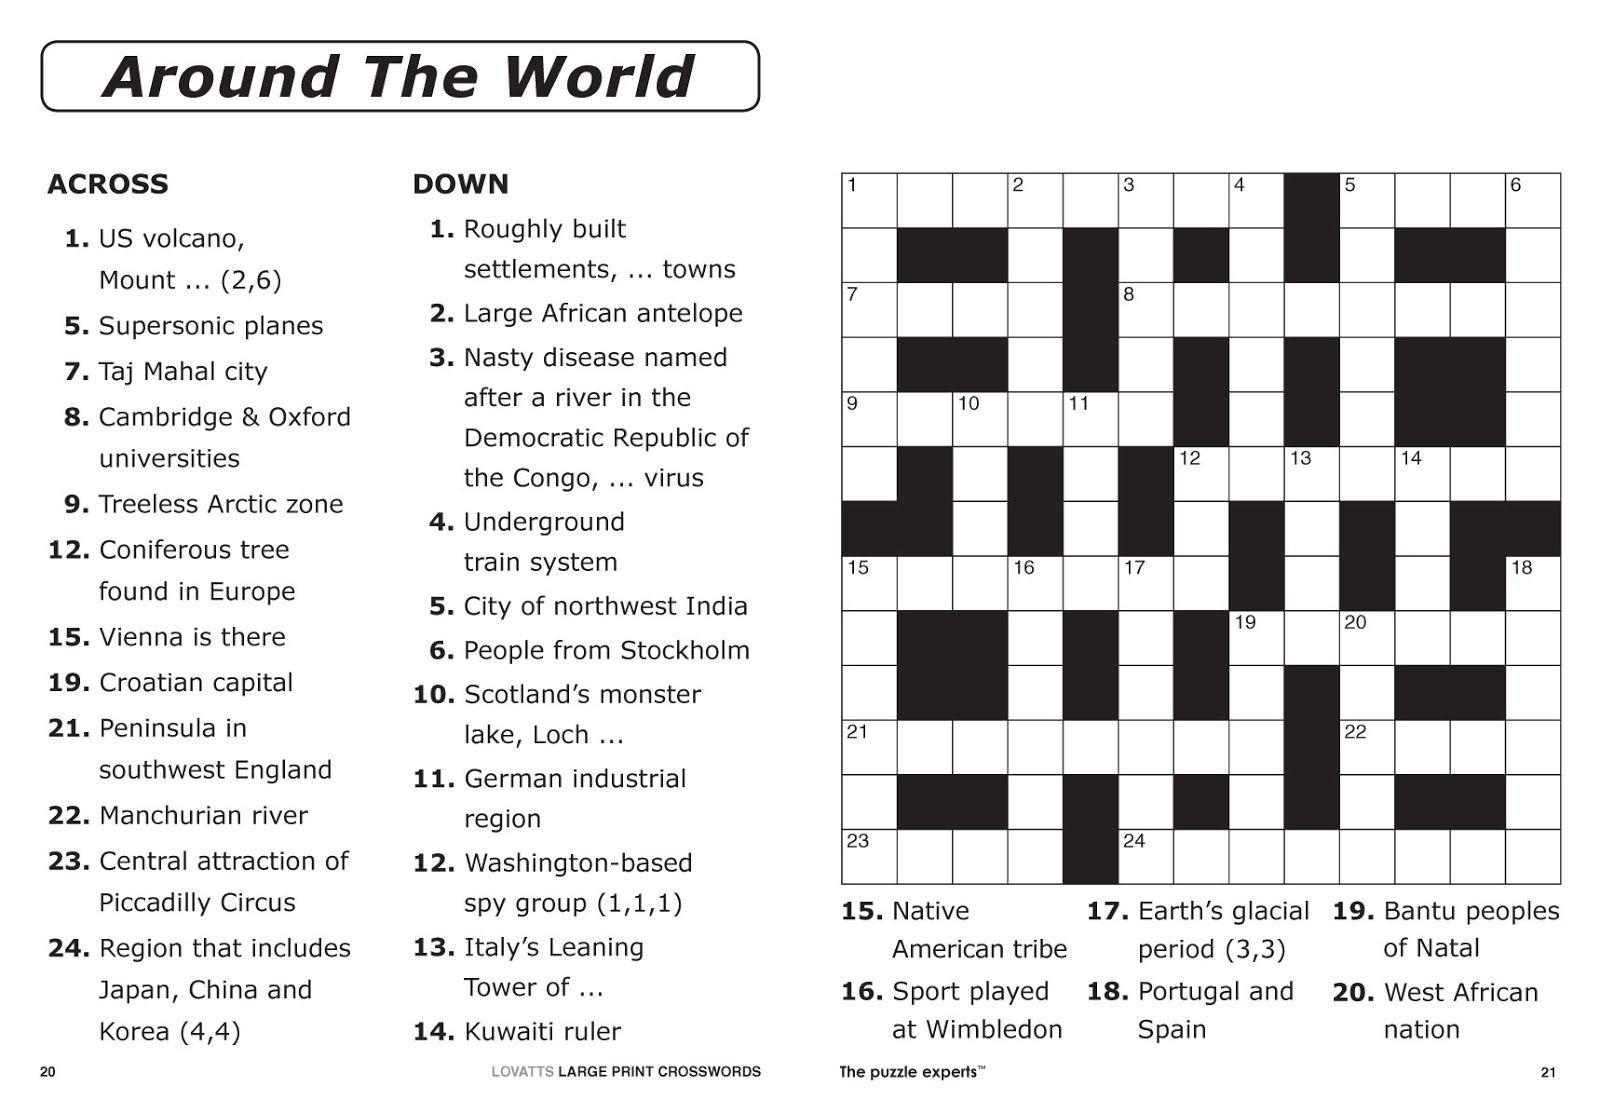 Easy Printable Crossword Puzzles | Elder Care & Dementia Care - Printable Crossword Puzzles For Elderly